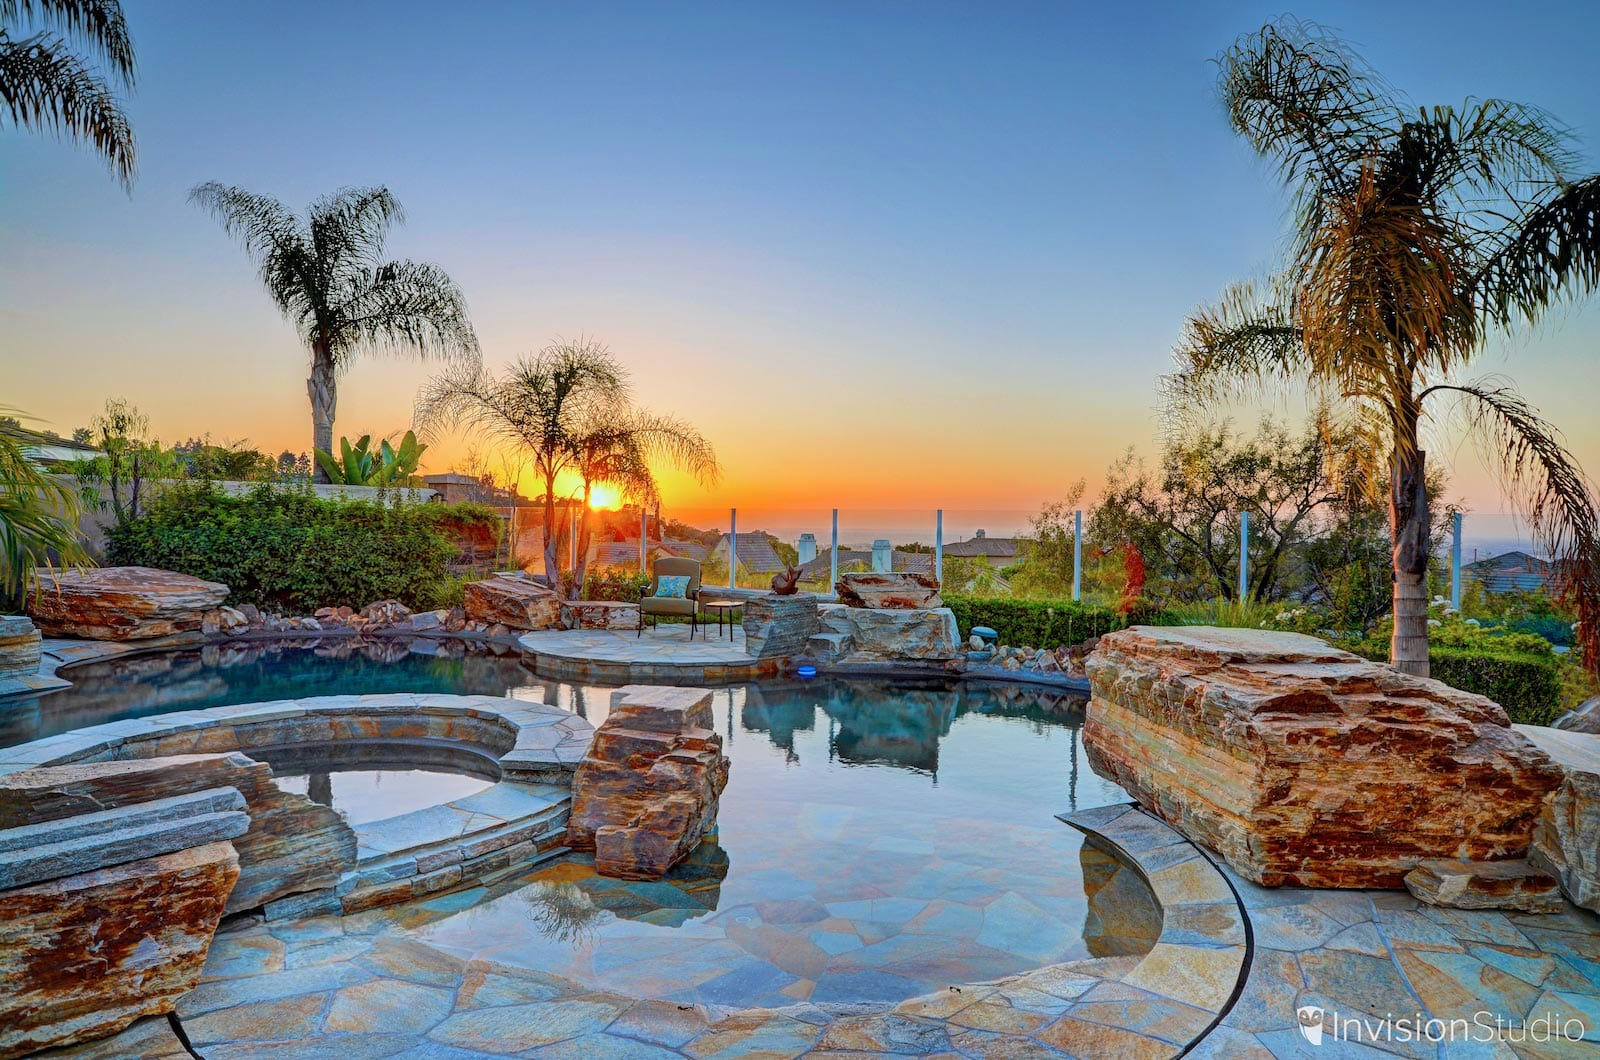 Santa Ana 3D Tour Service Provider   Santa Ana 360 Photography Services   Santa Ana Aerial Photography Services   Santa Ana HDR Luxury Real Estate Photography Services